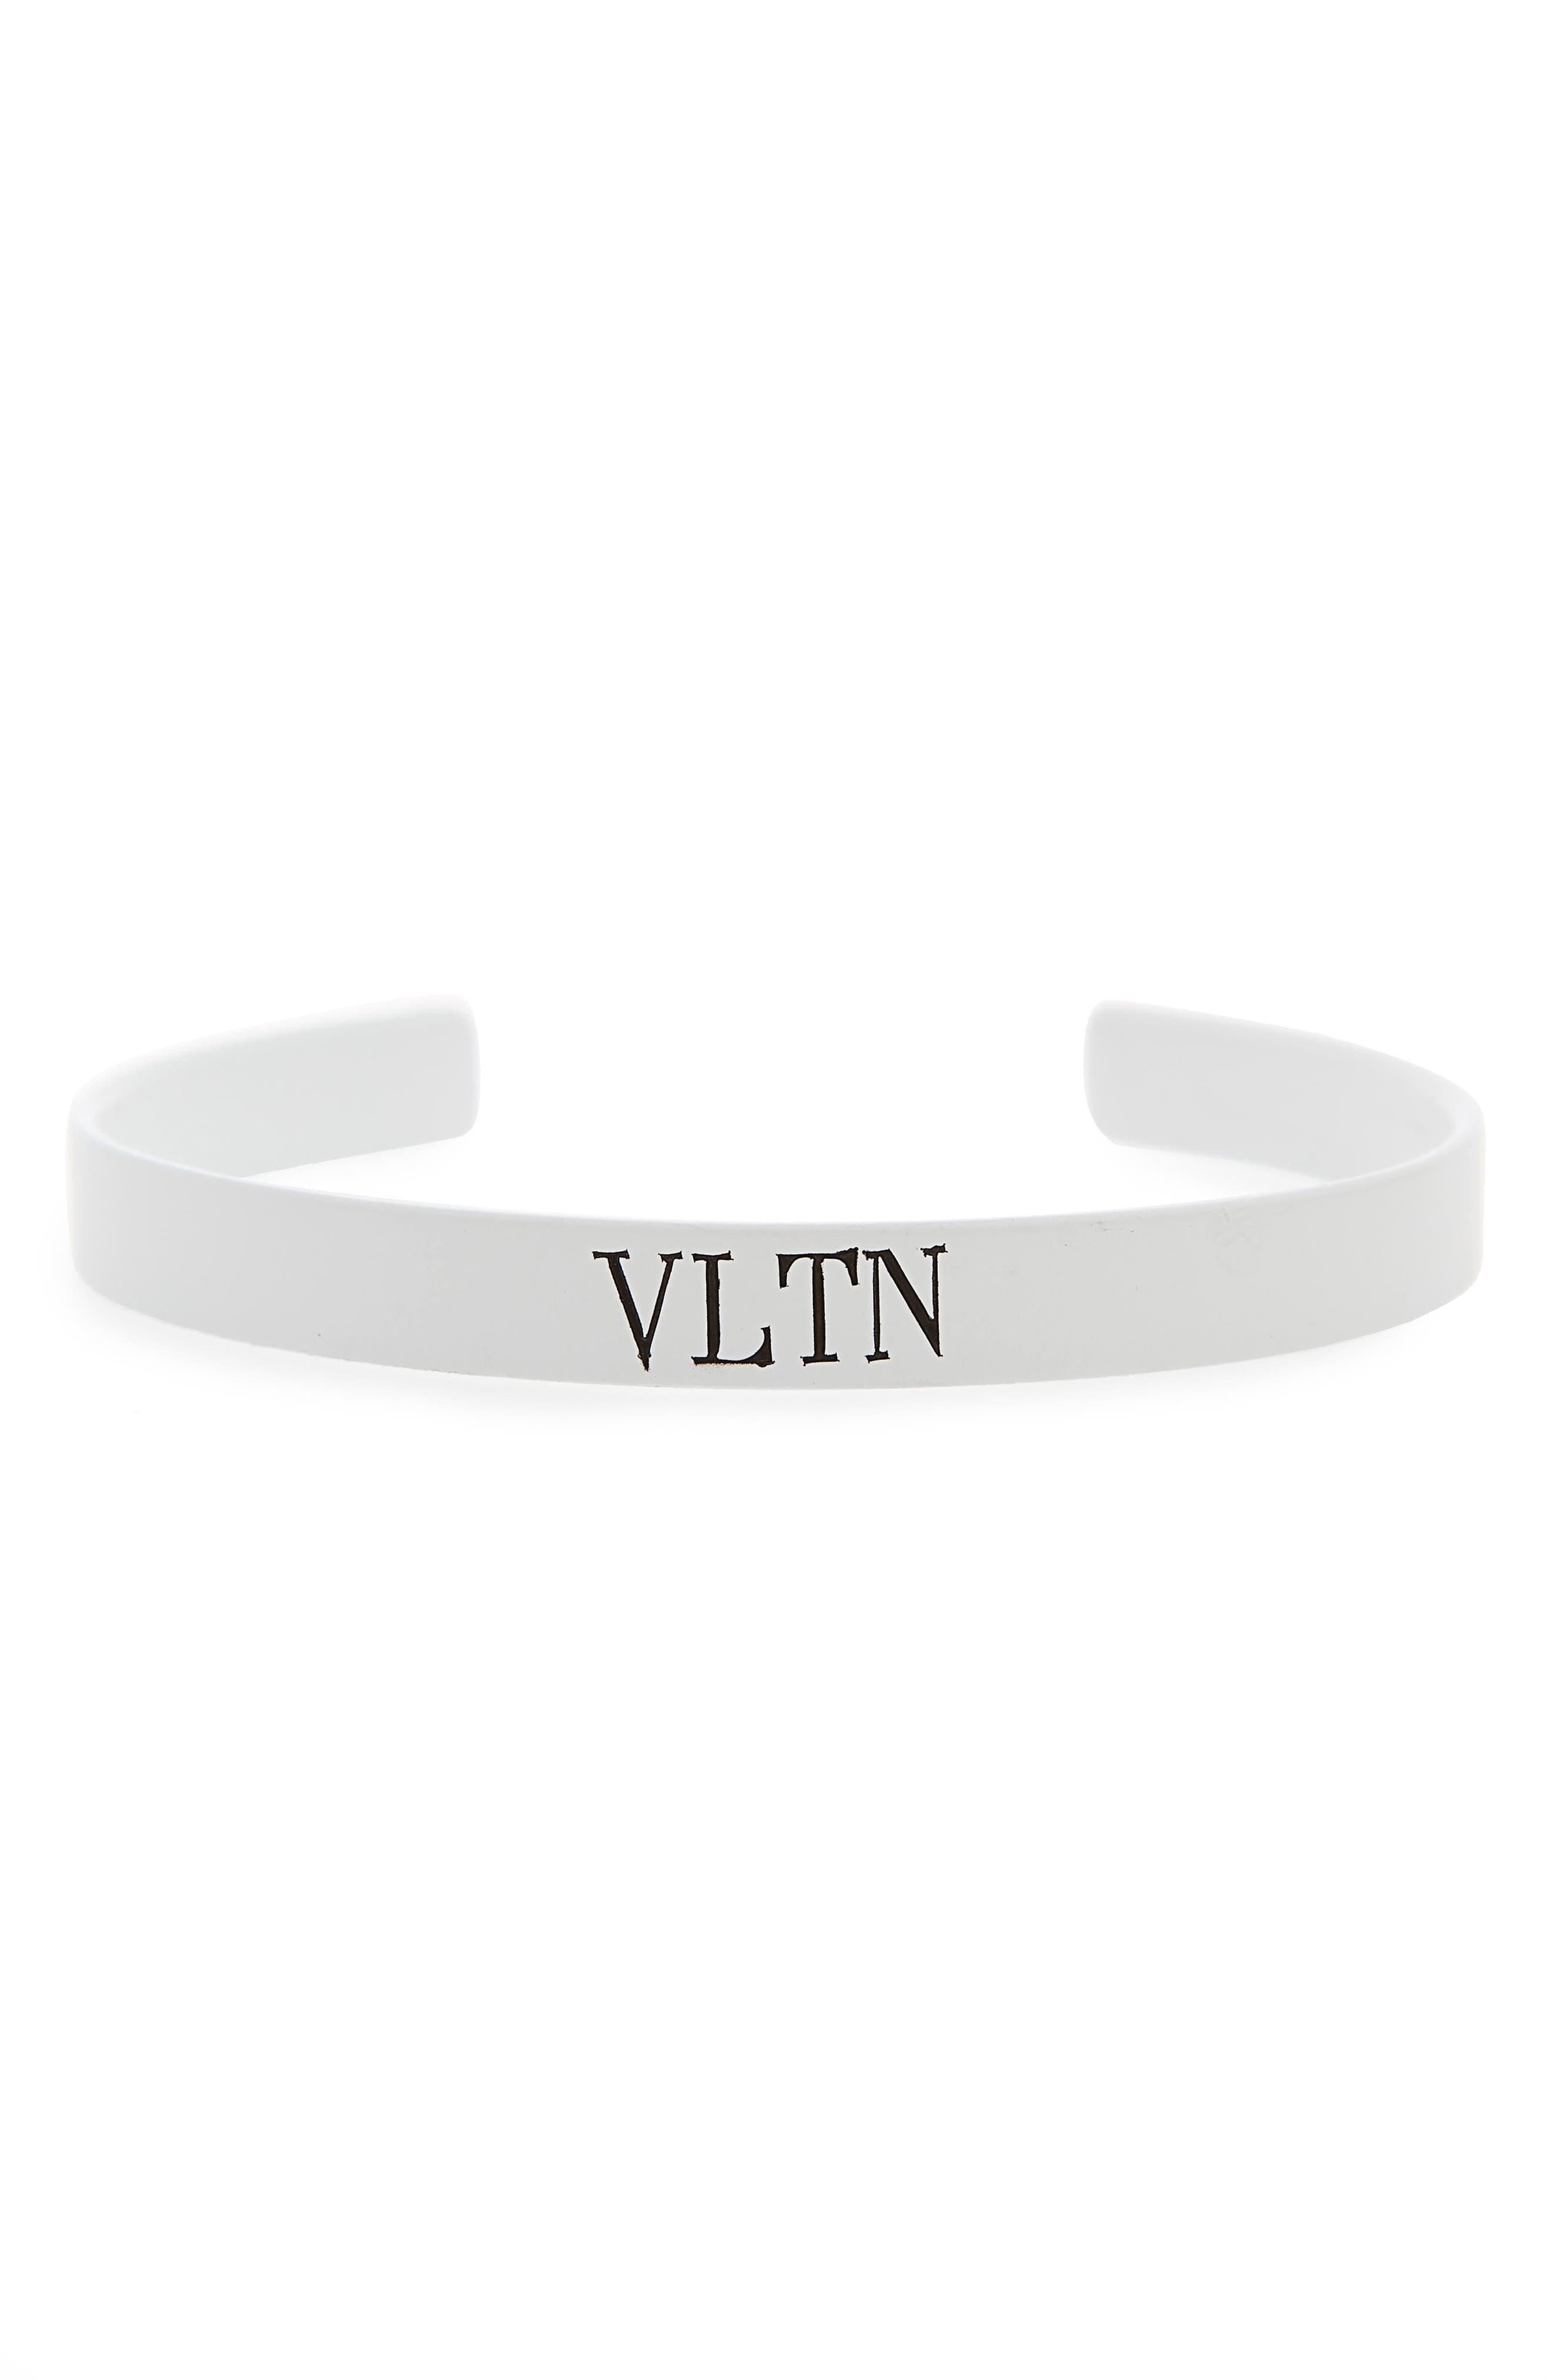 Valentino VLTN Small Cuff Bracelet